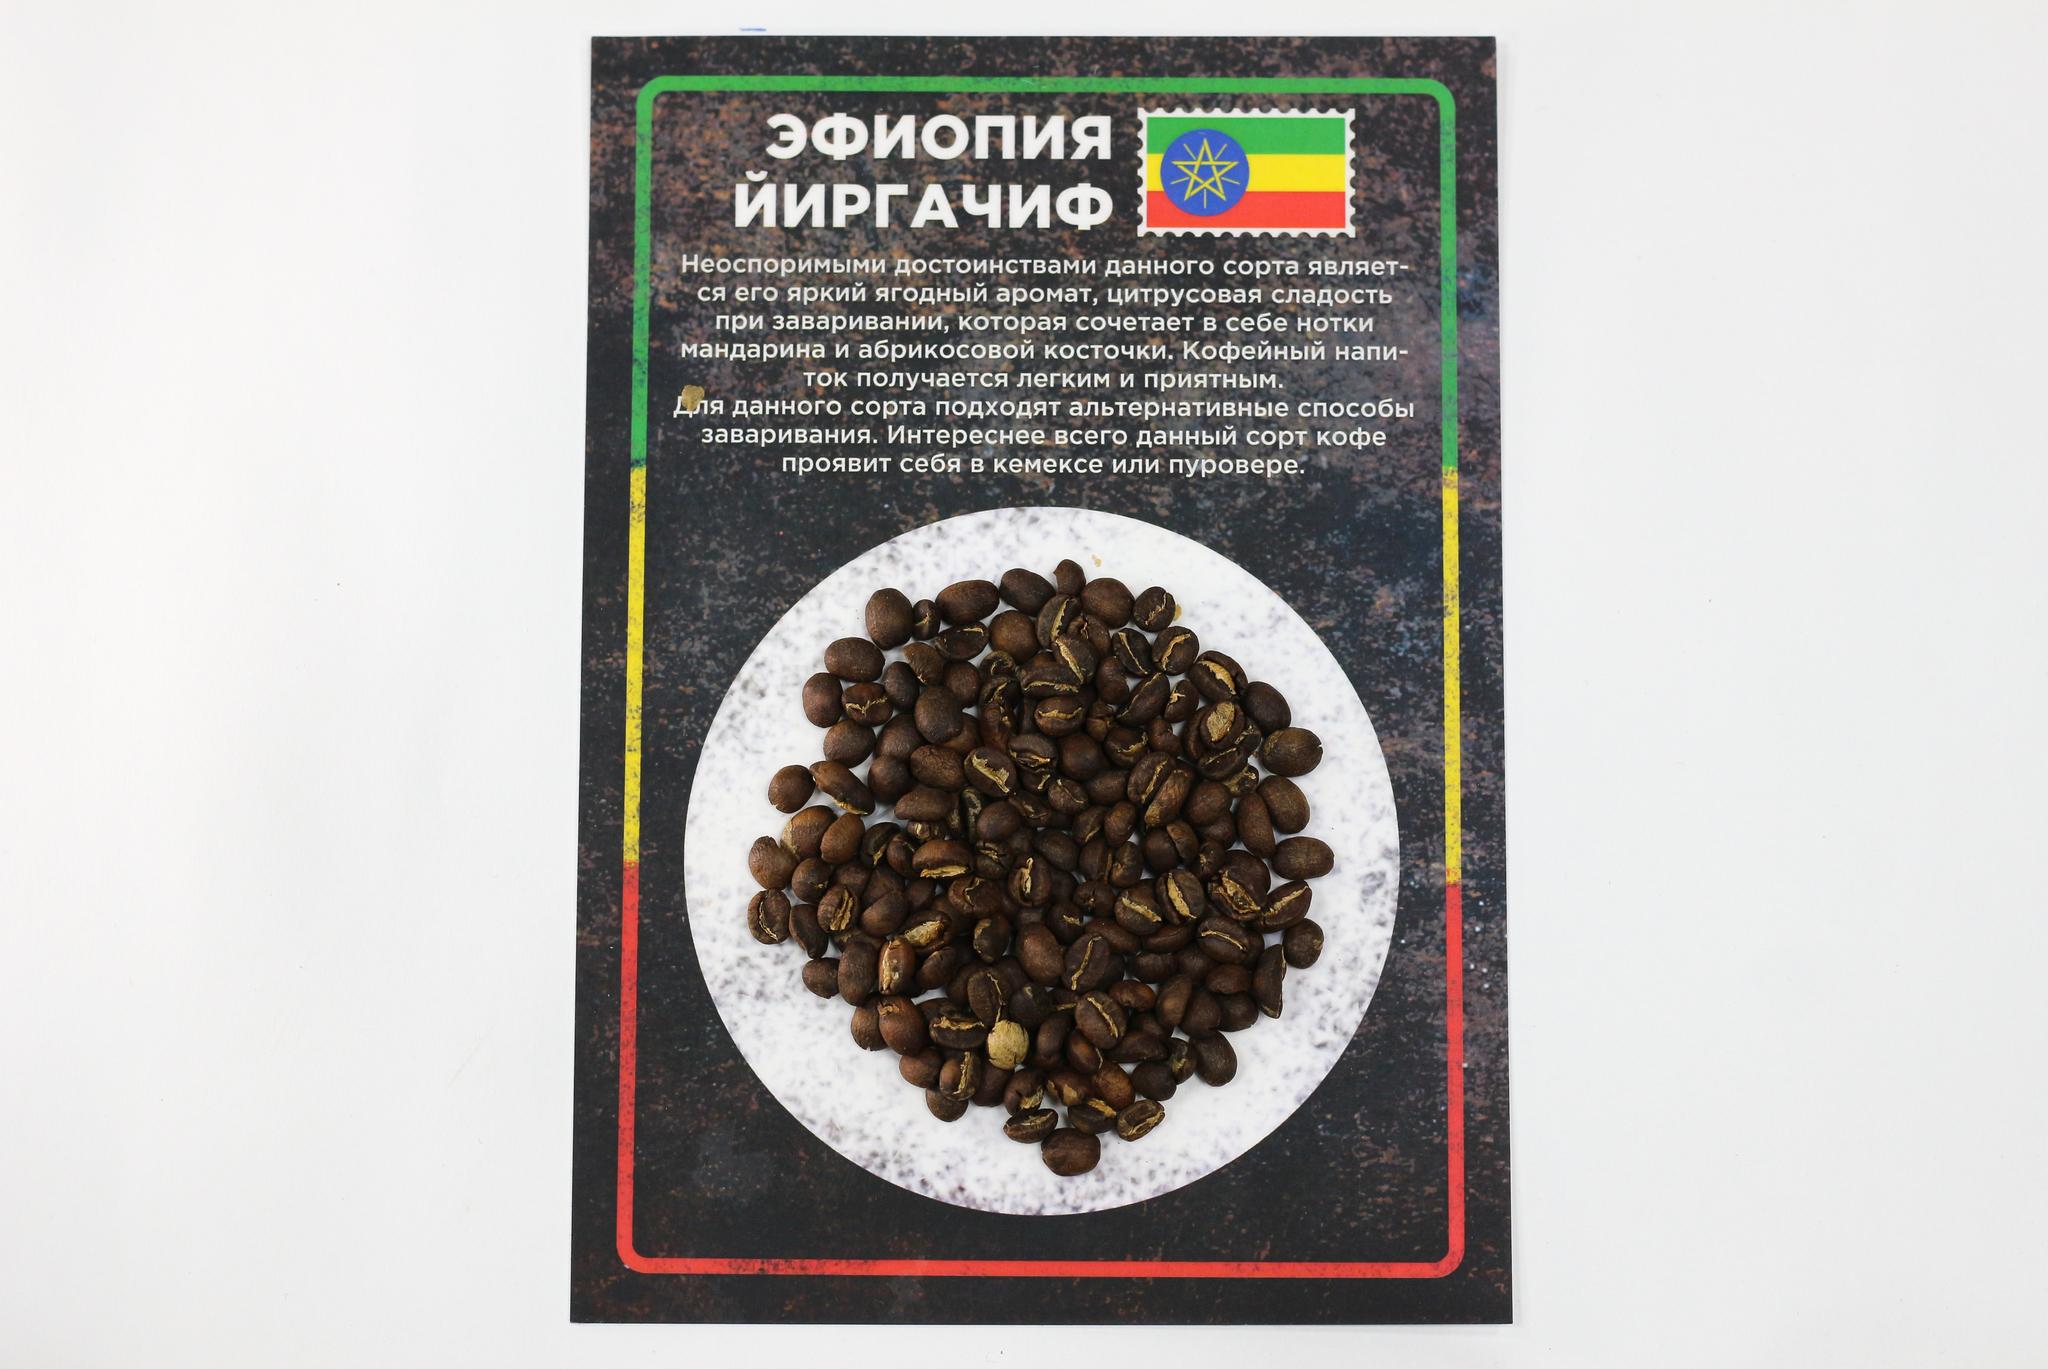 Форма арабики из Эфиопии